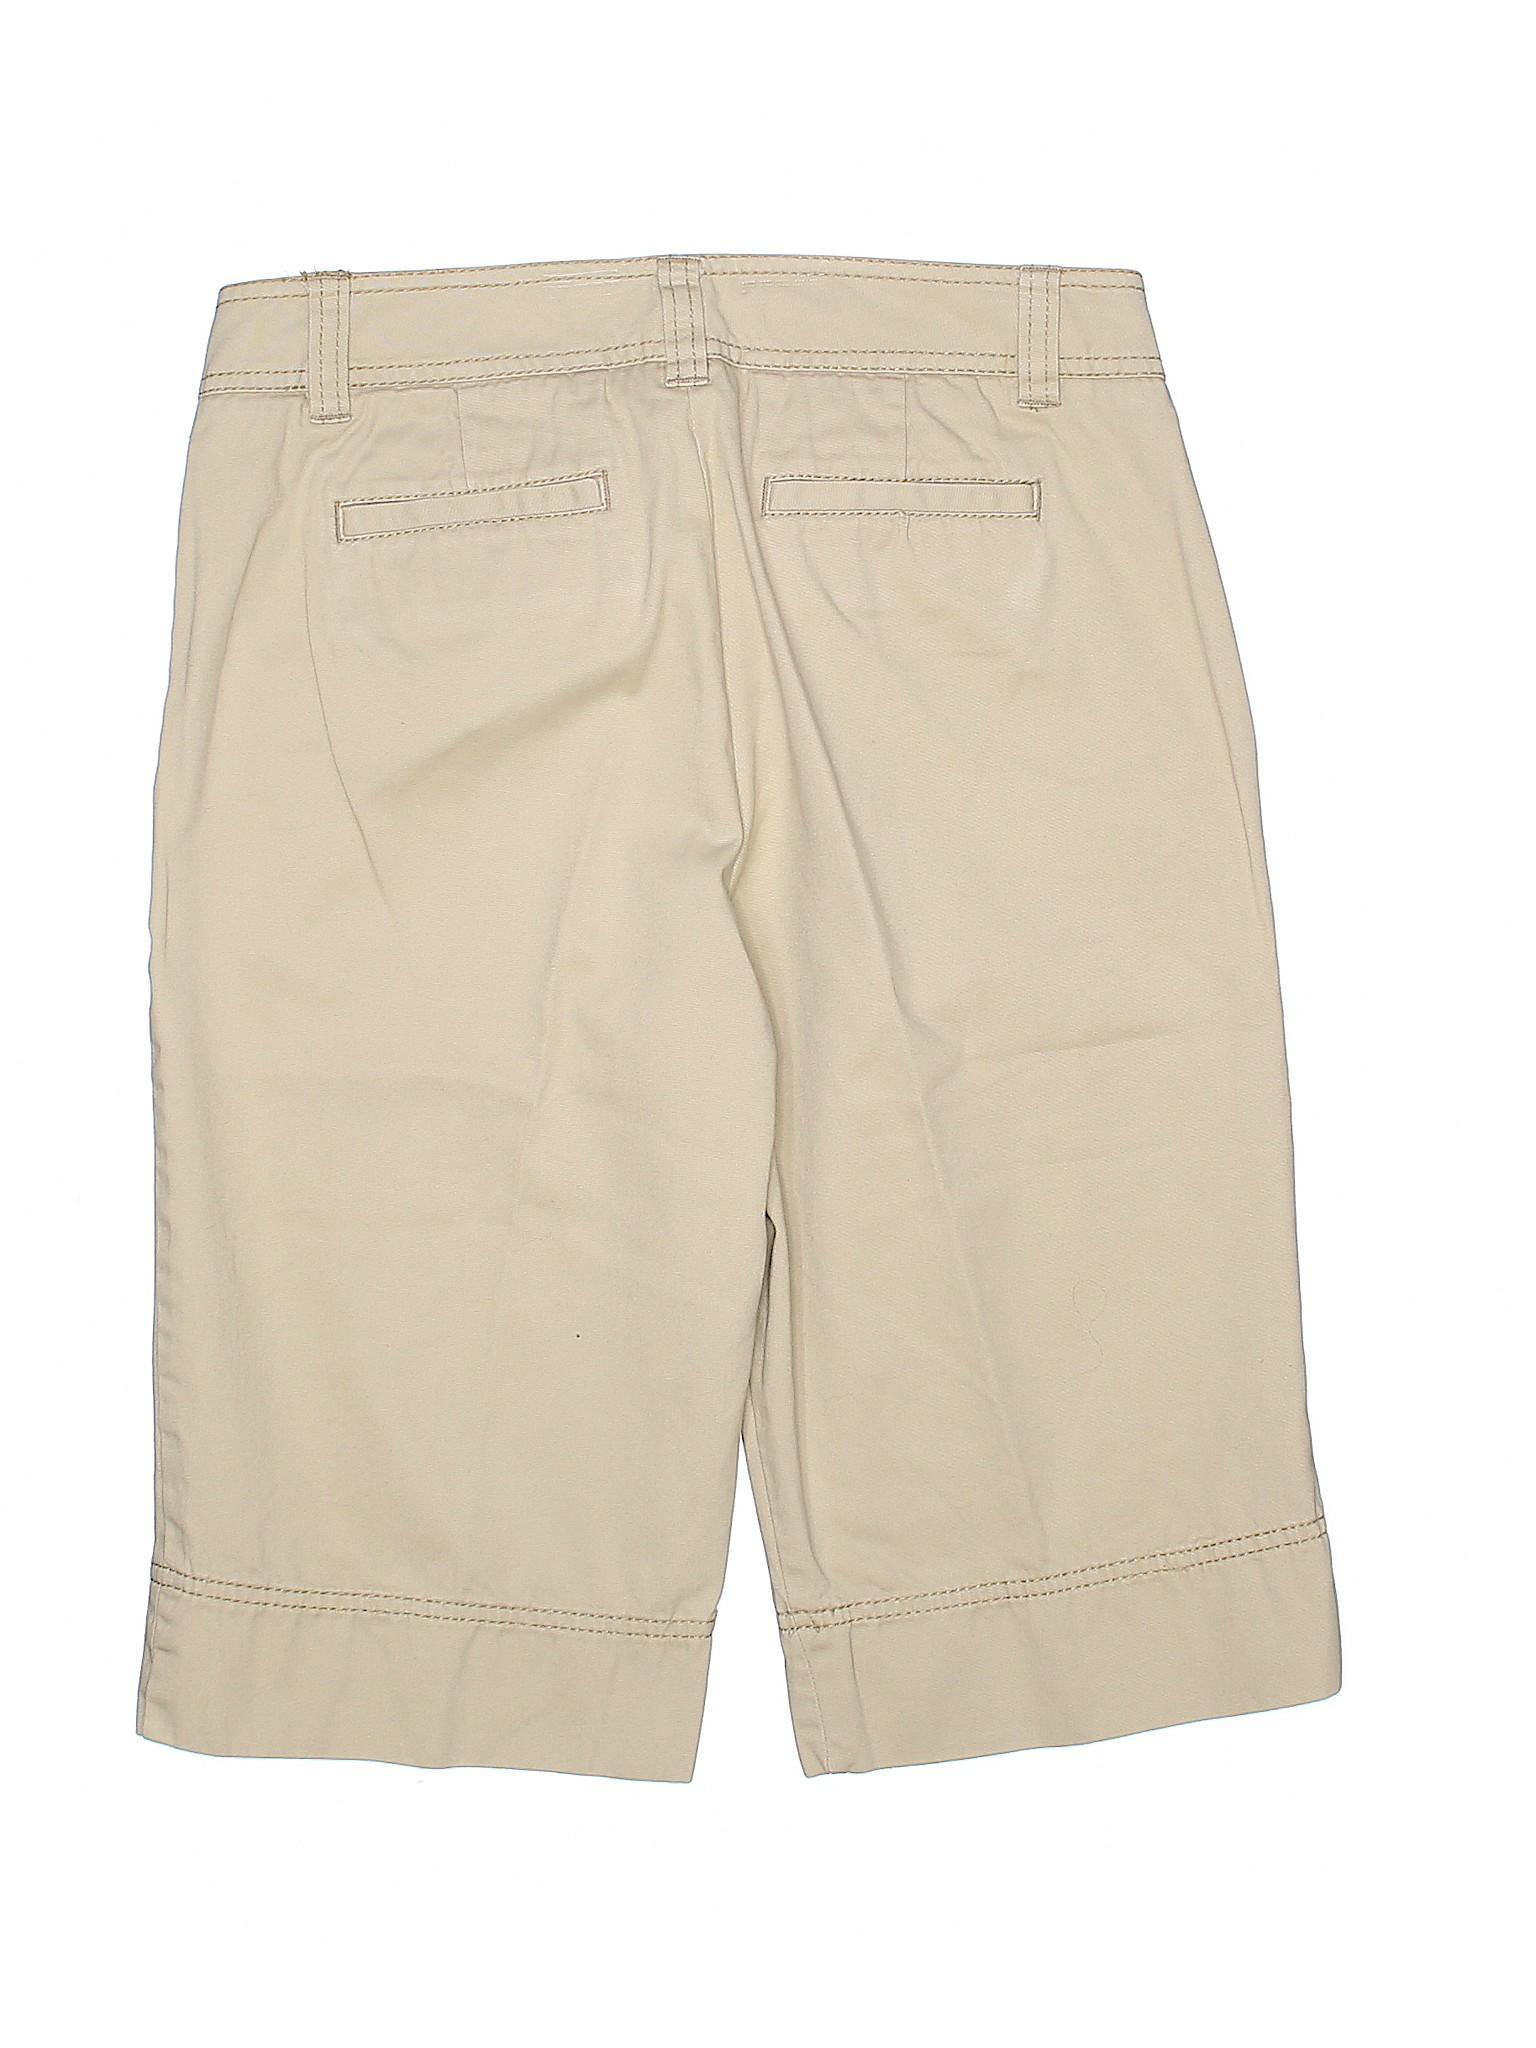 Leisure winter CAbi winter Khaki Shorts Khaki Leisure Shorts Leisure CAbi 7Aw5wq